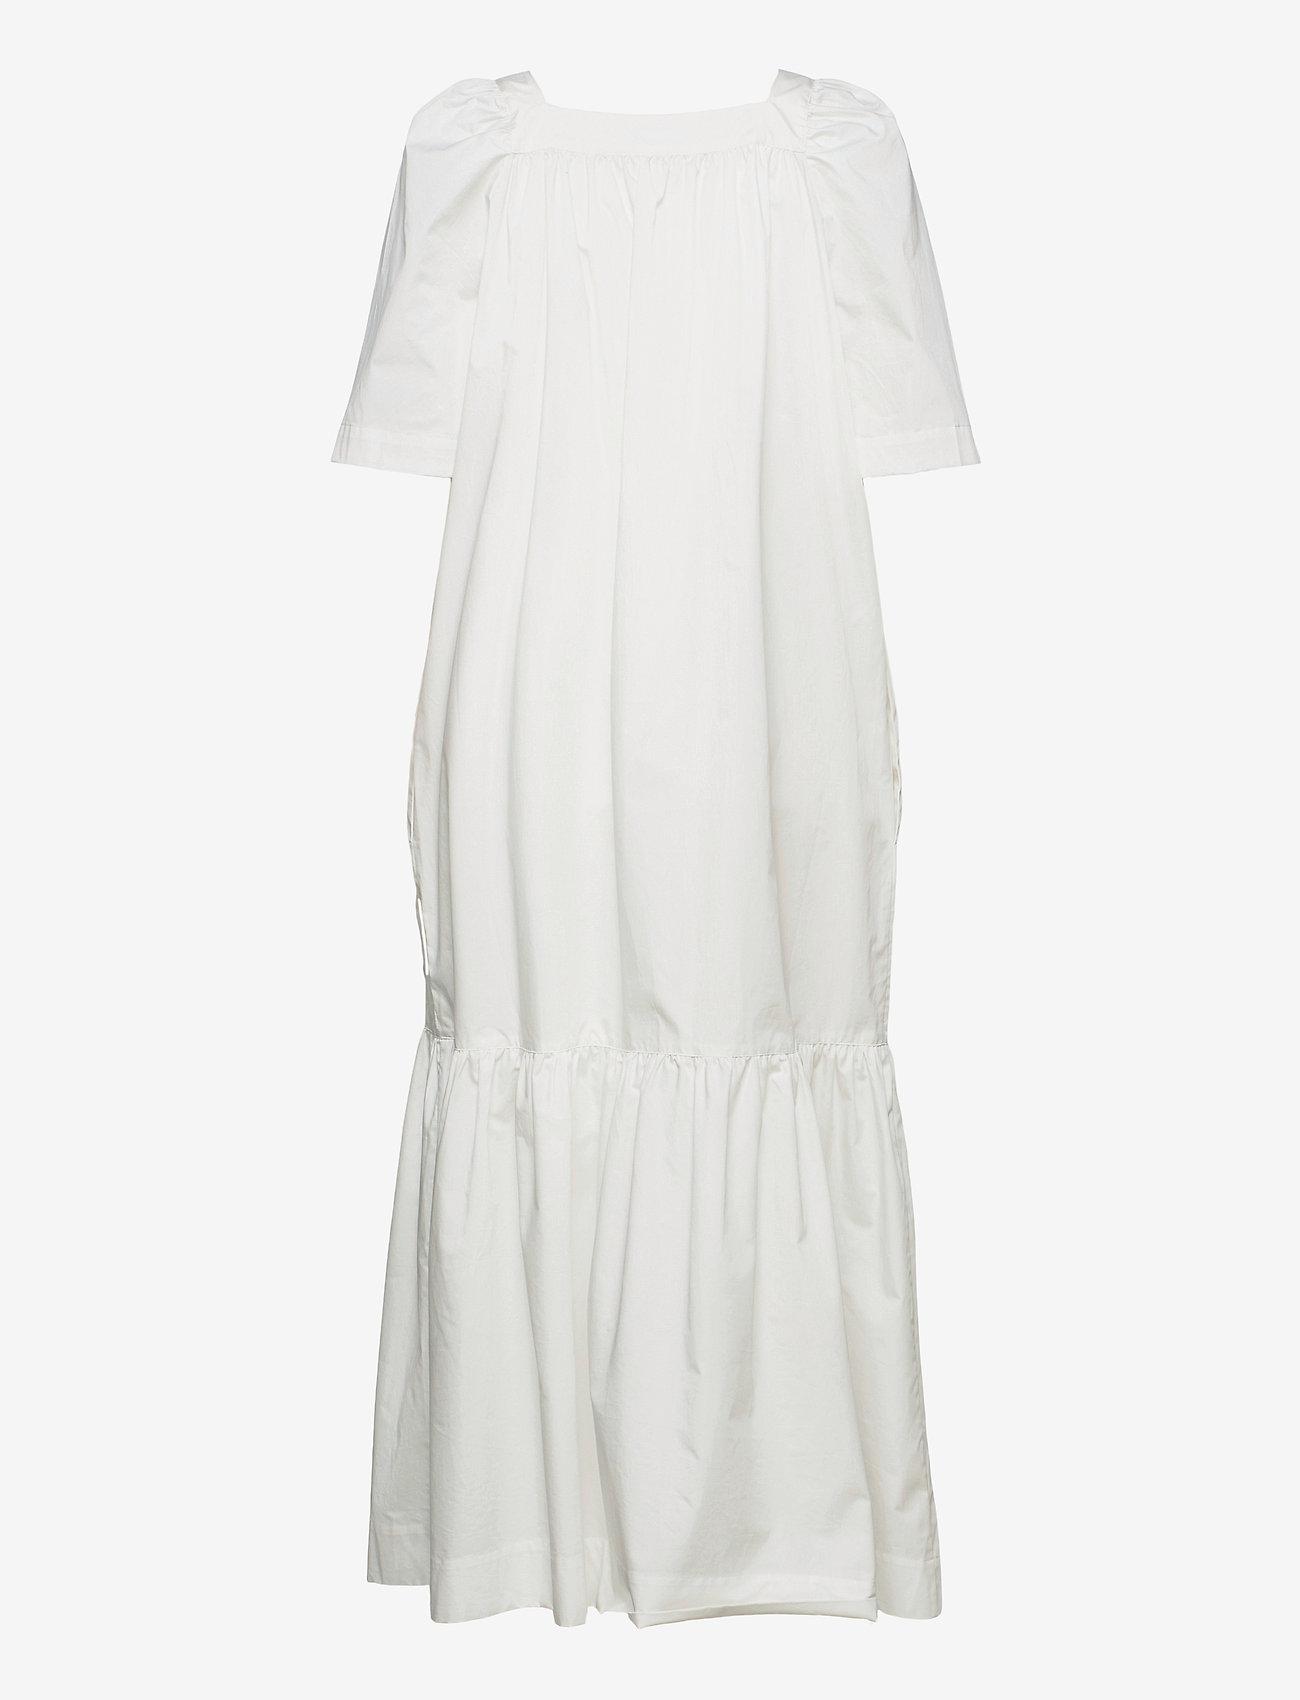 RODEBJER - RODEBJER DONYA - maxi dresses - white - 1